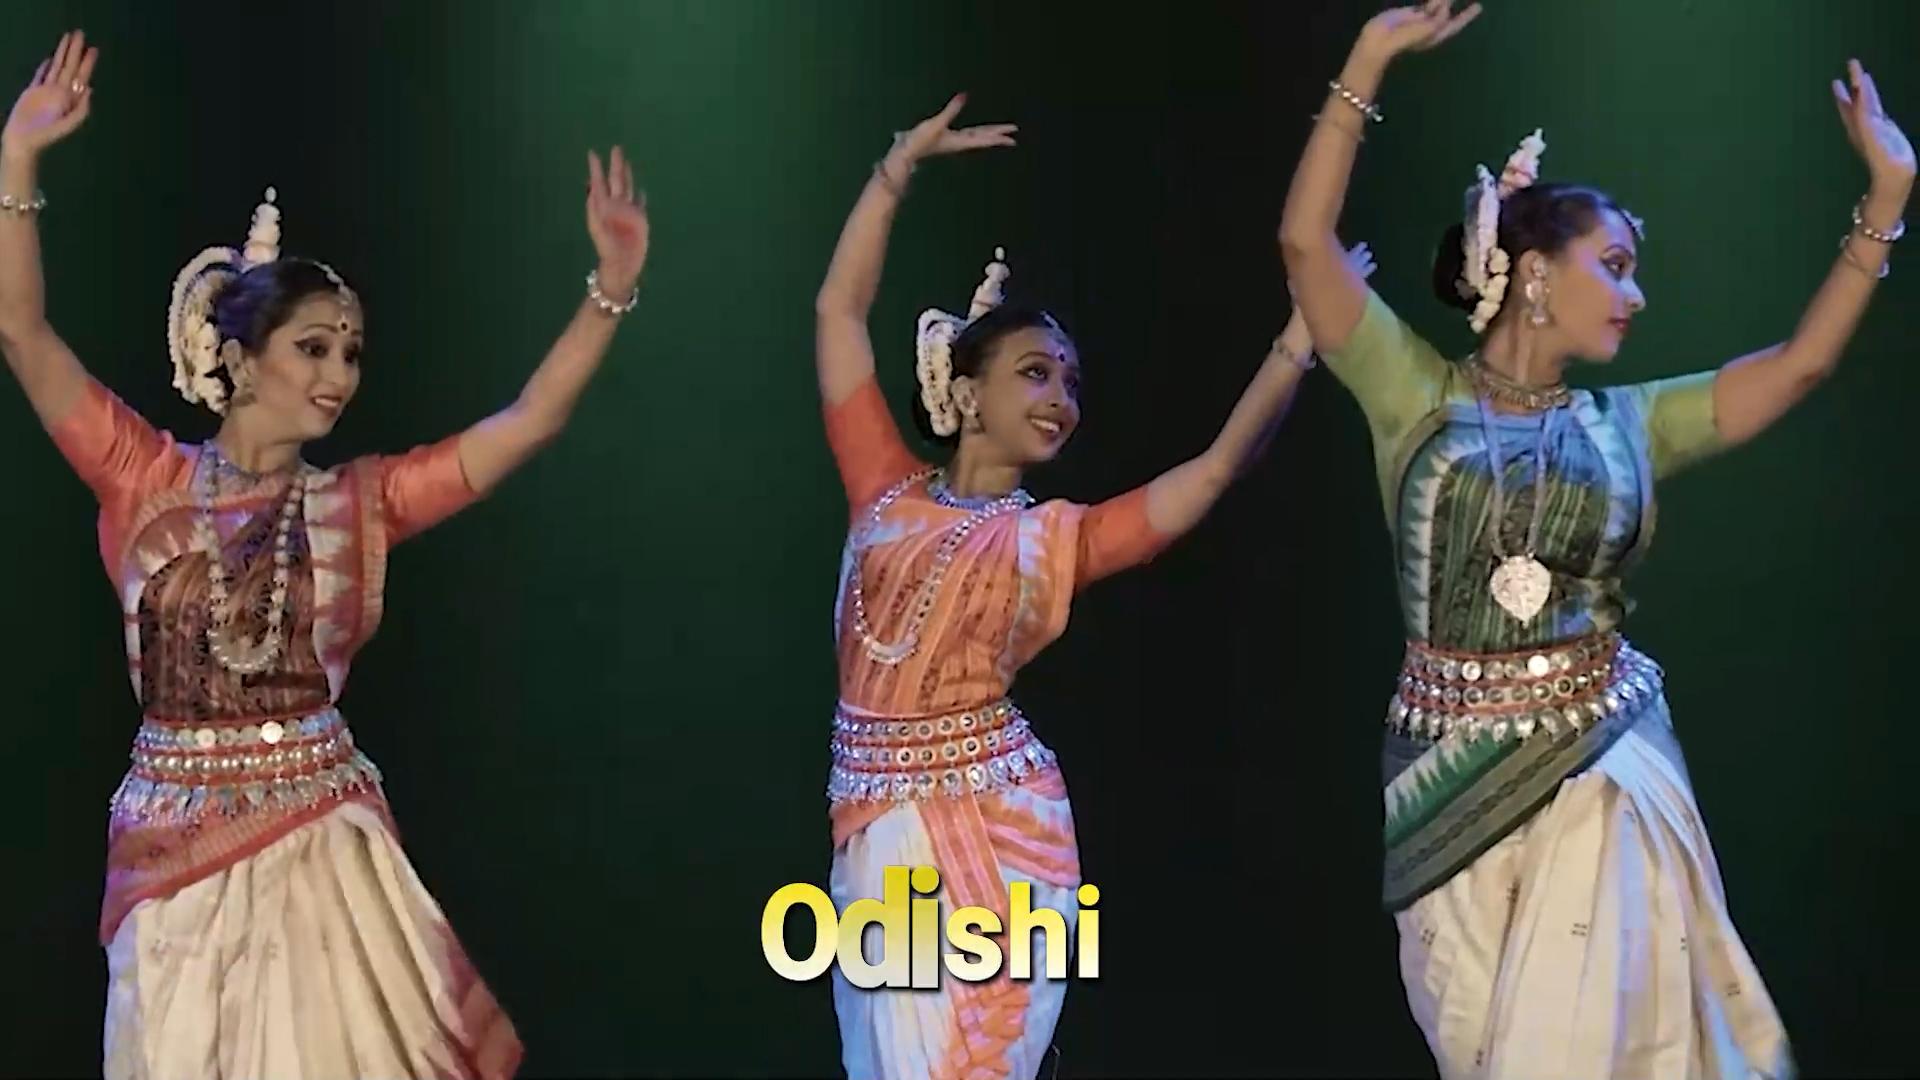 Musical Dance Healing For Lust & Porn Addiction